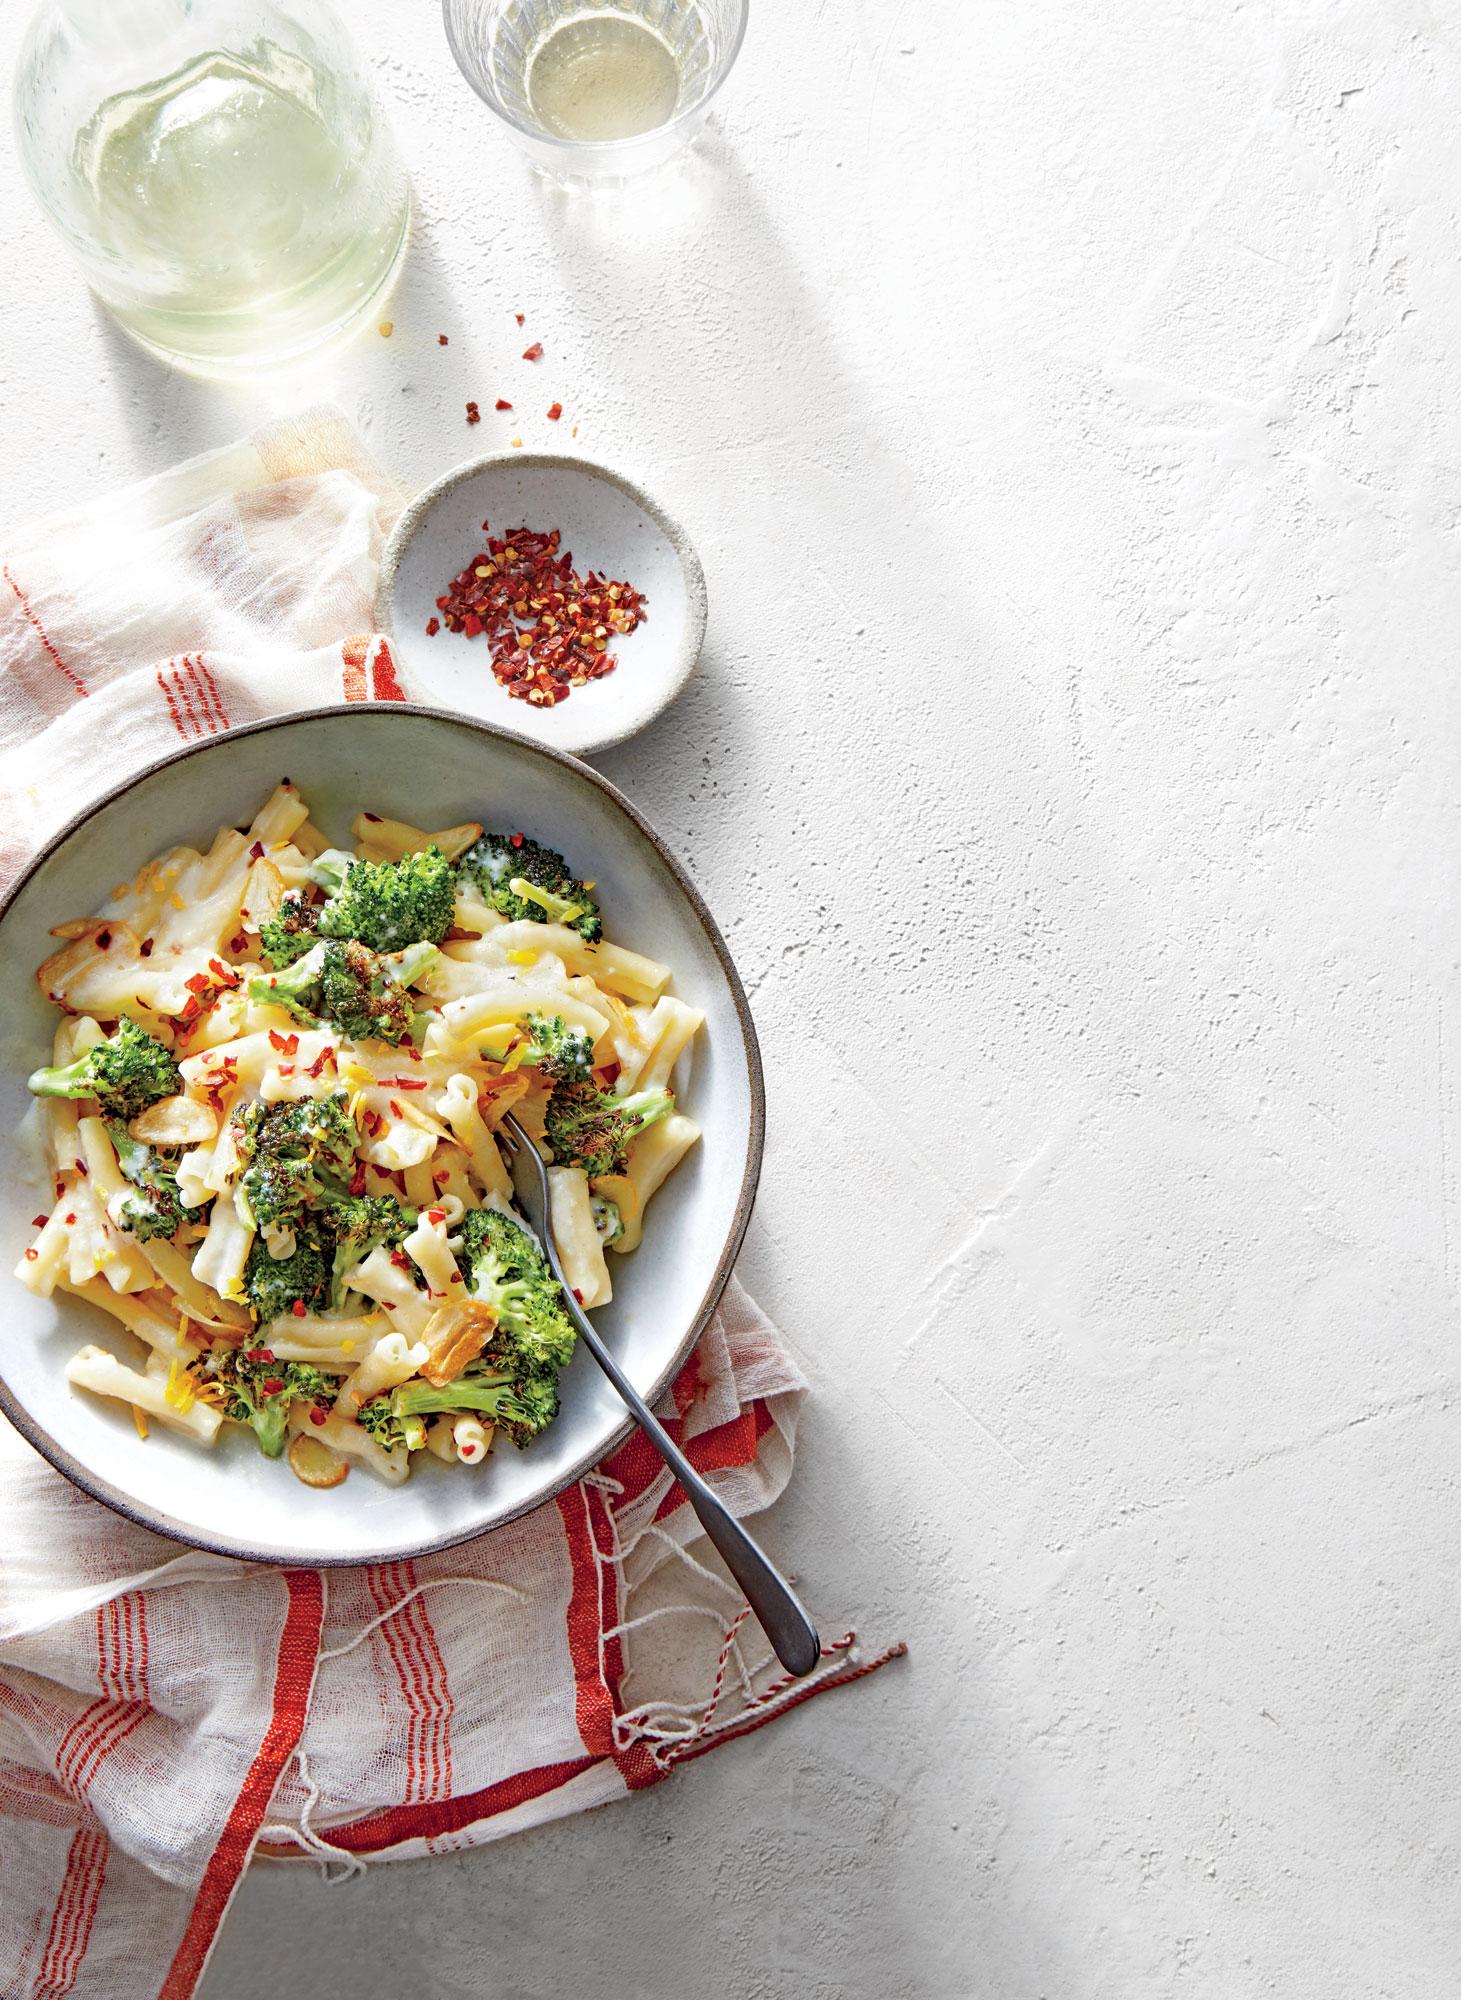 Pasta with Charred Broccoli, Feta, and Lemon